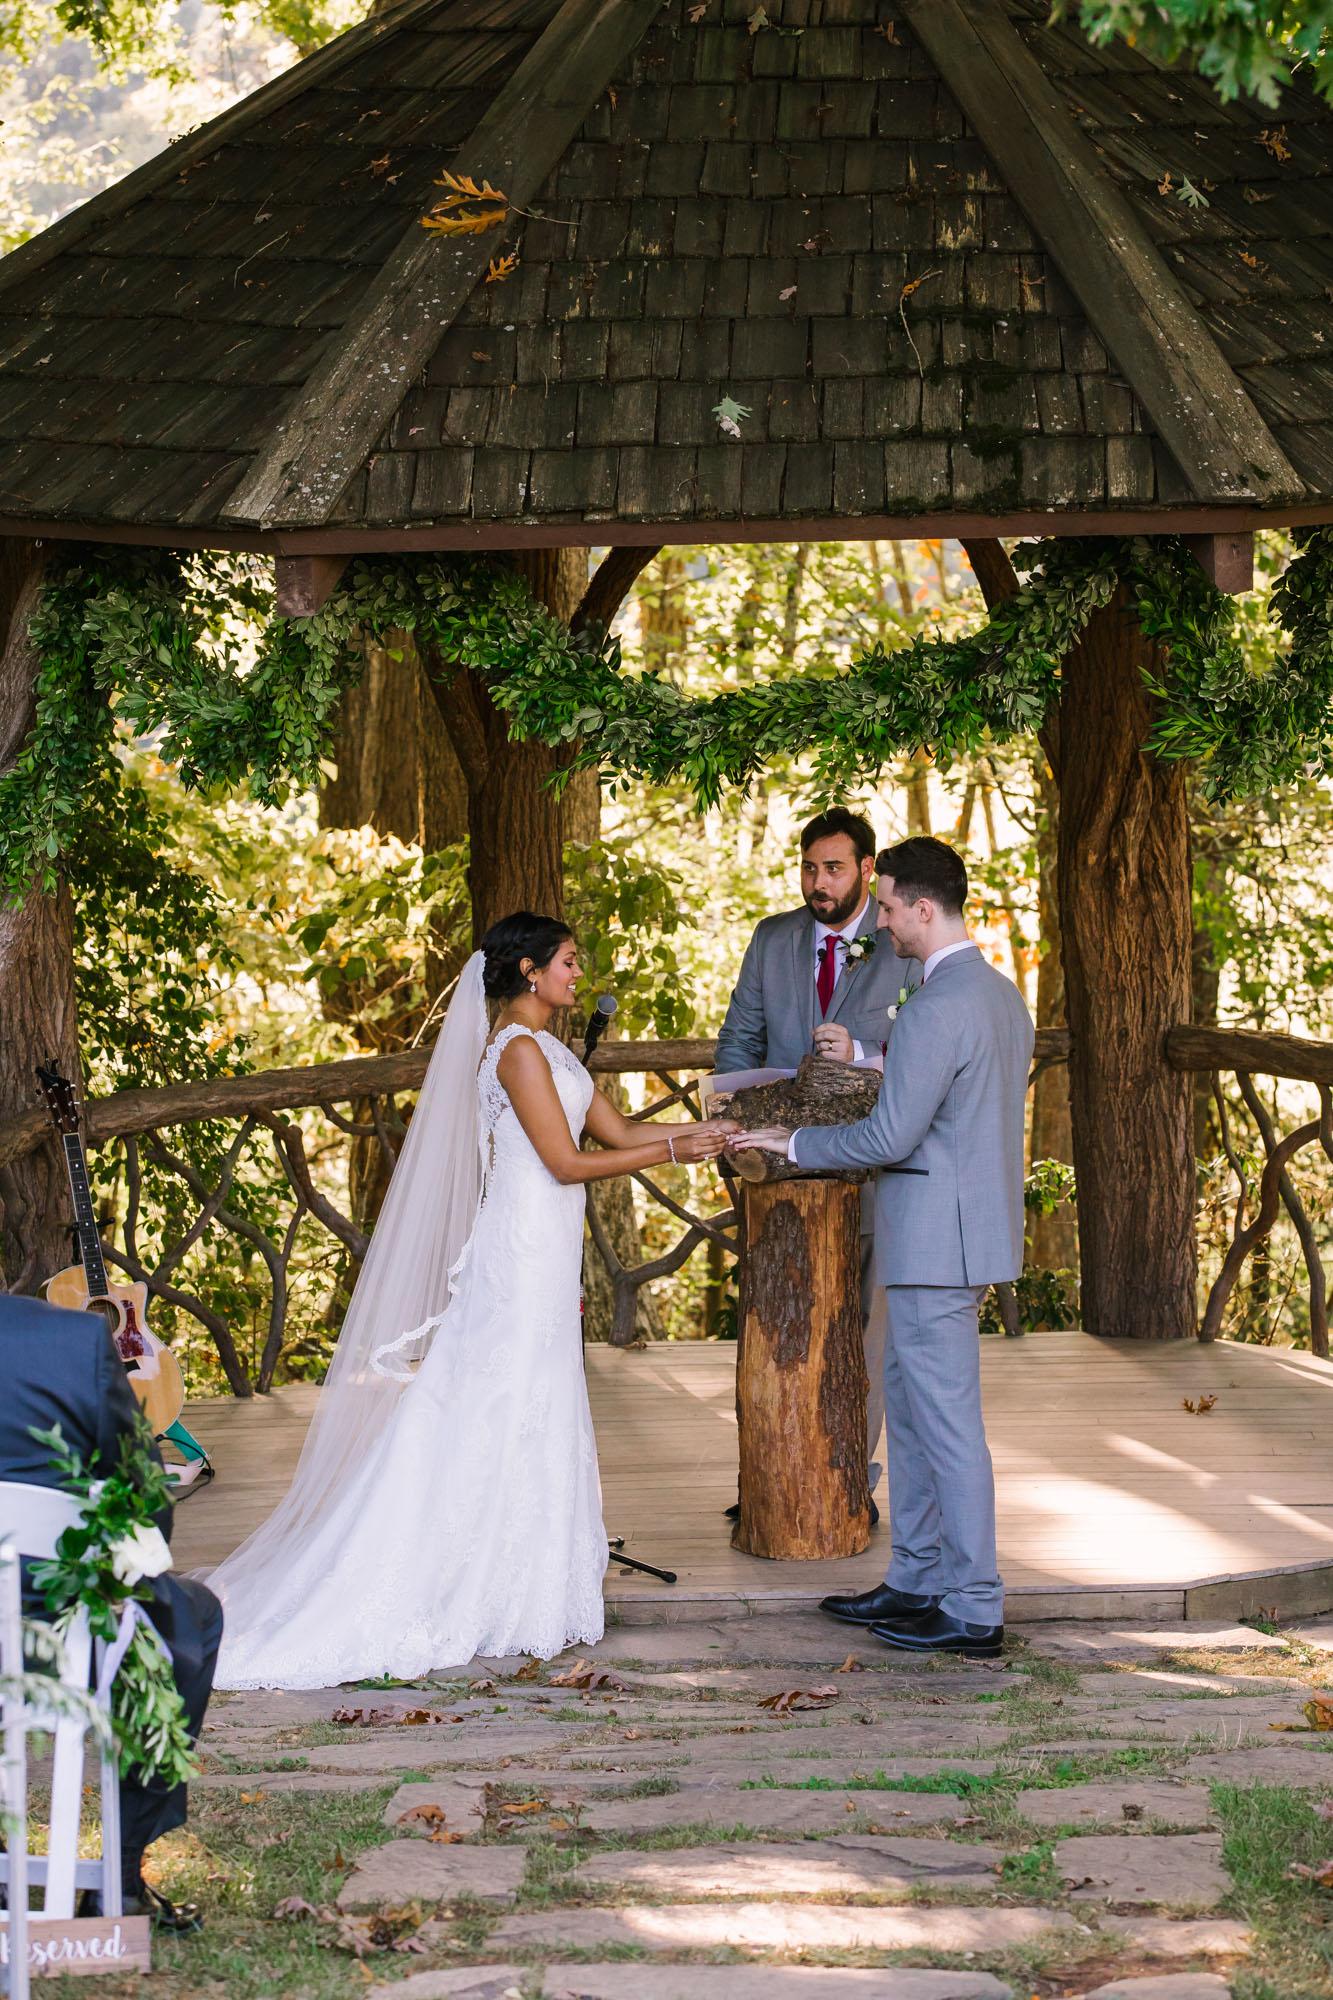 Waynesville NC Wedding Photography | Wedding Ceremony exchanging of rings